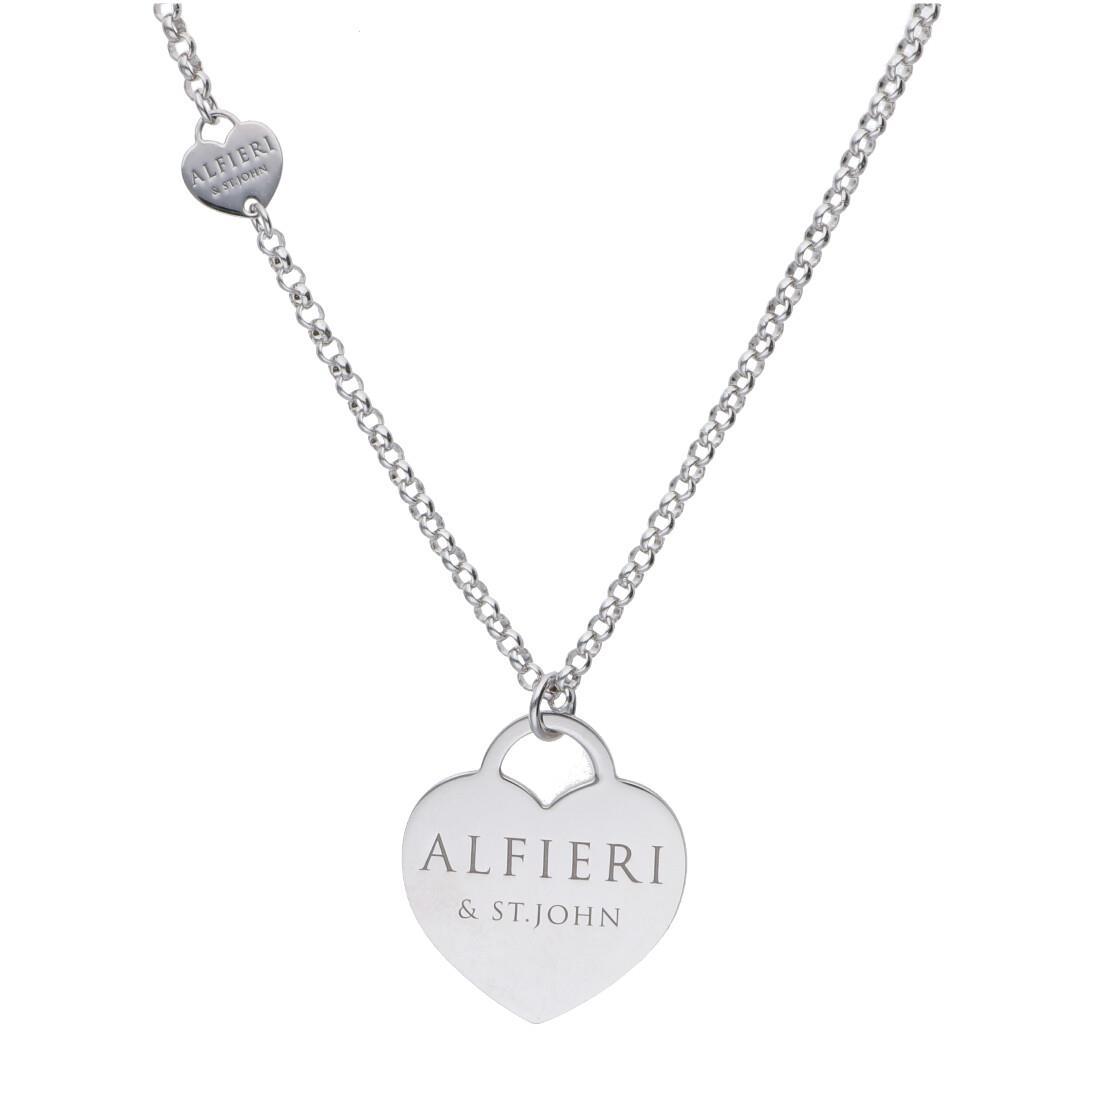 Collana lunga in argento - ALFIERI & ST. JOHN 925